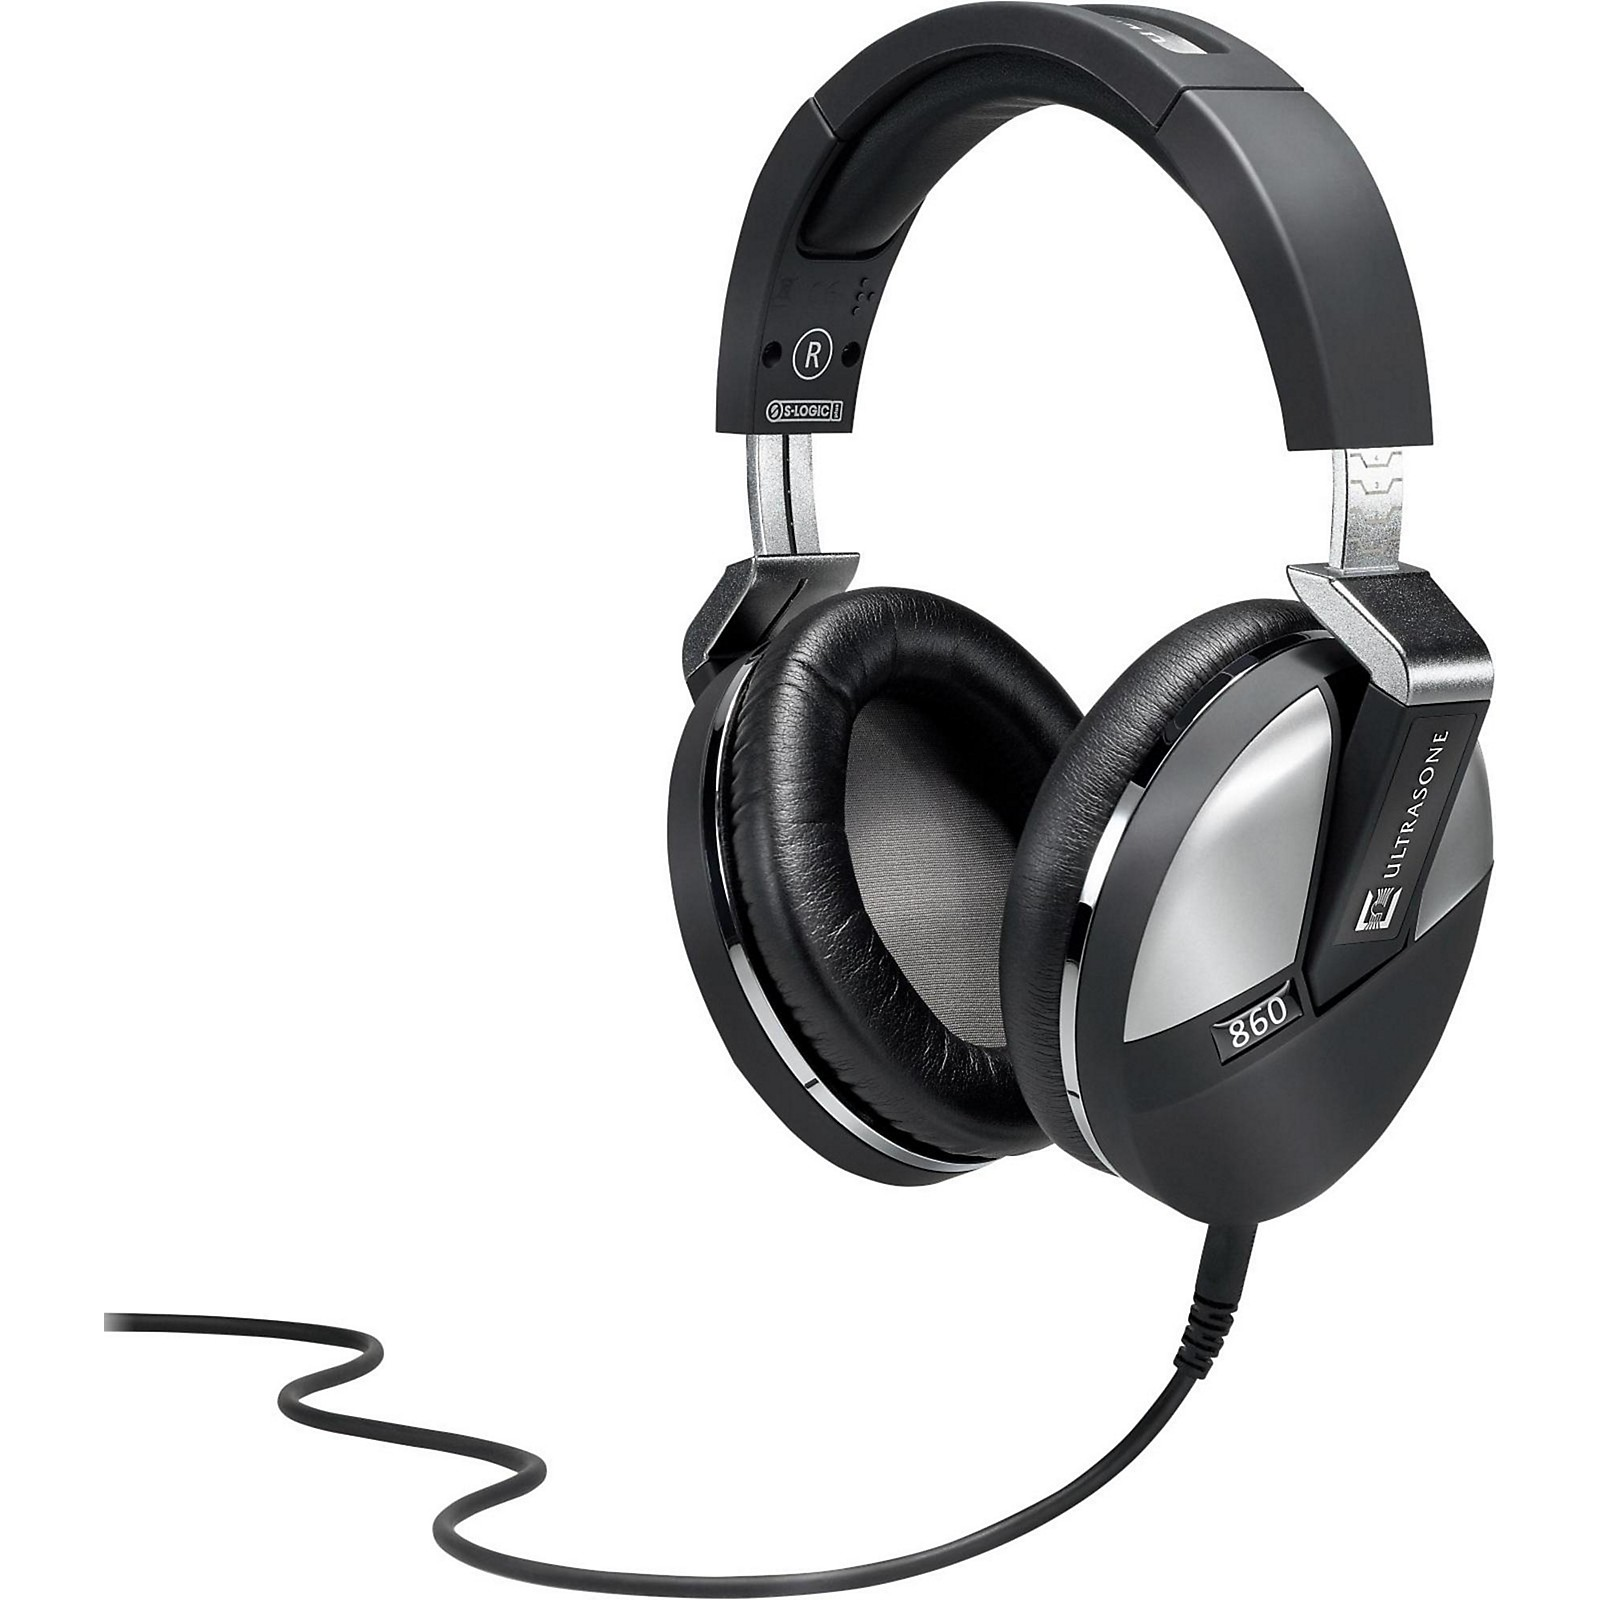 Ultrasone Performance 860 Closed-Back Headphones